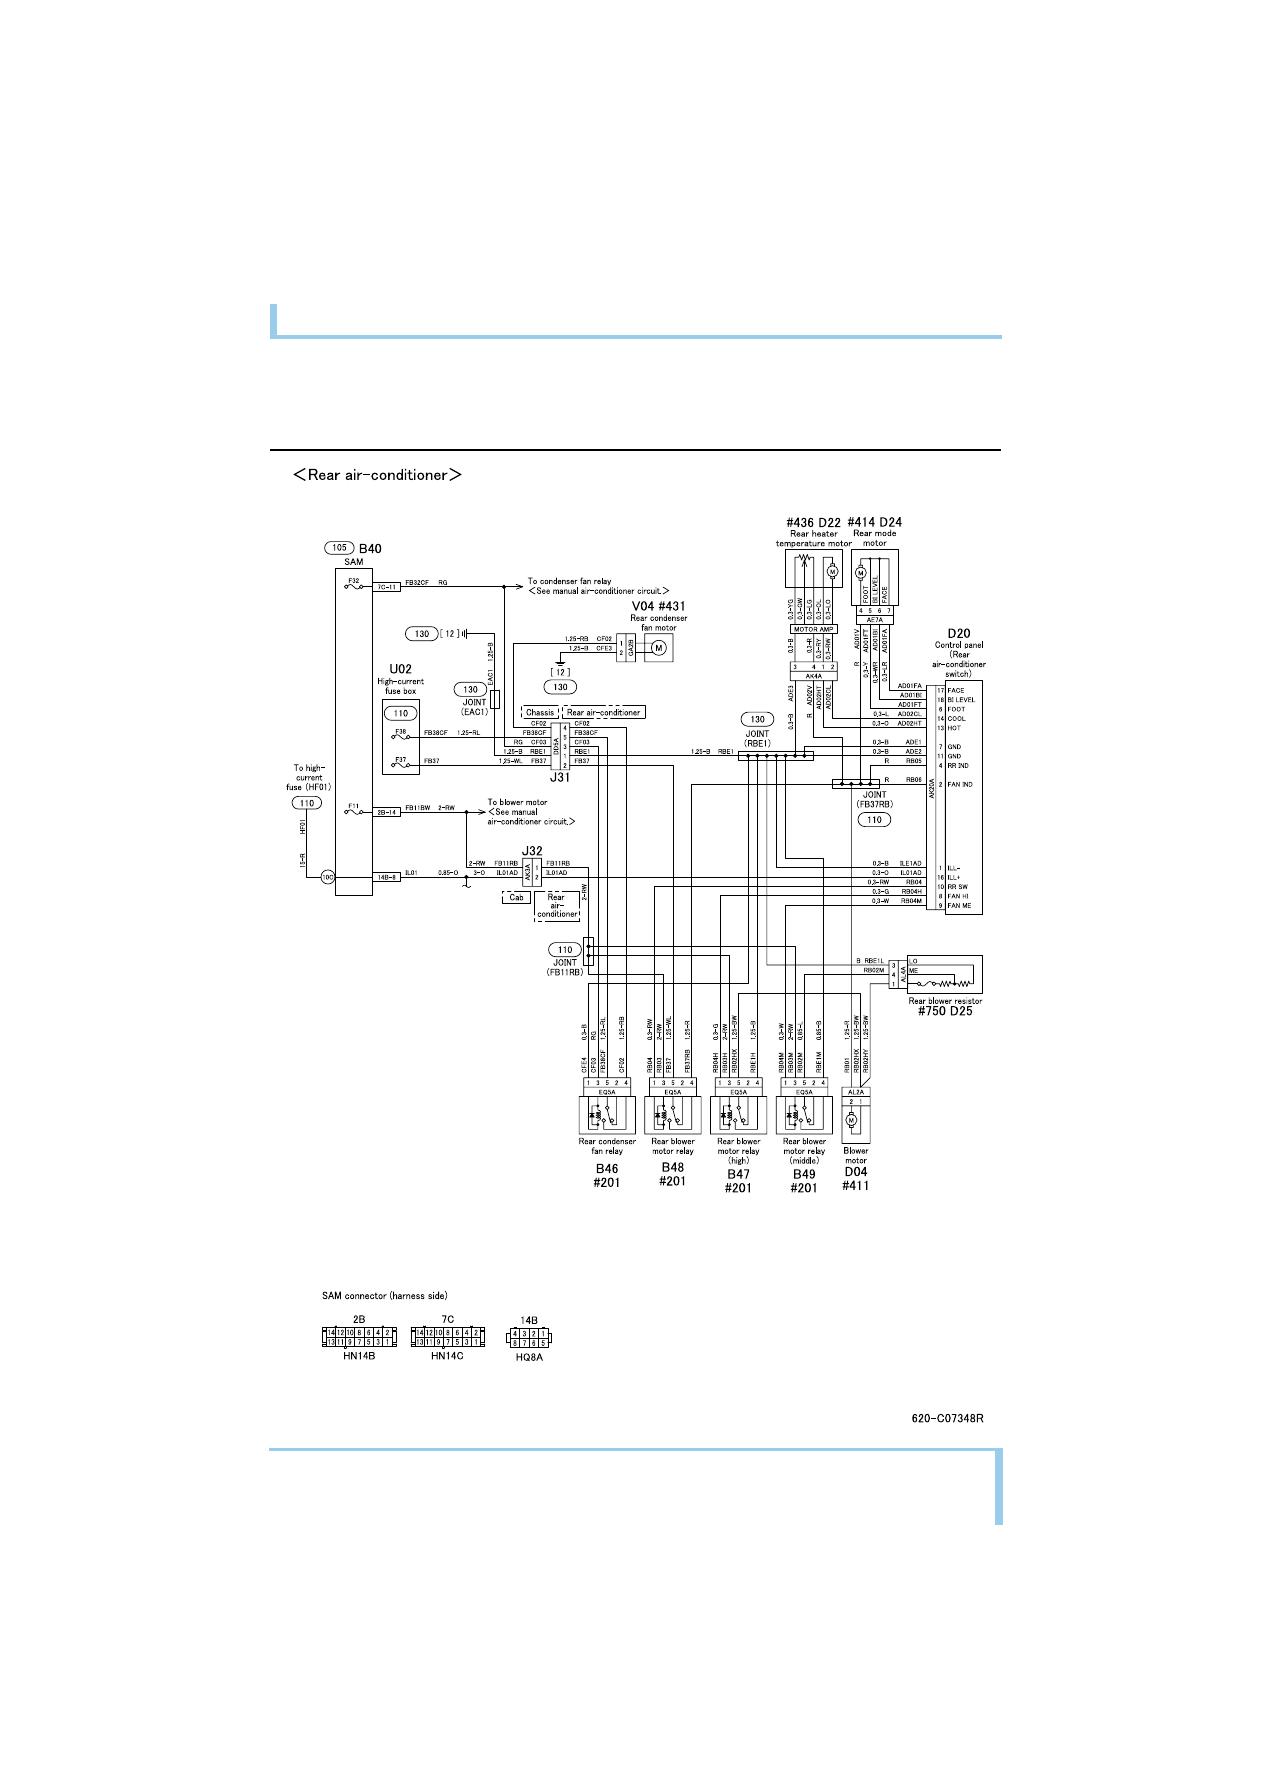 Wiring Diagram Mitsubishi Canter